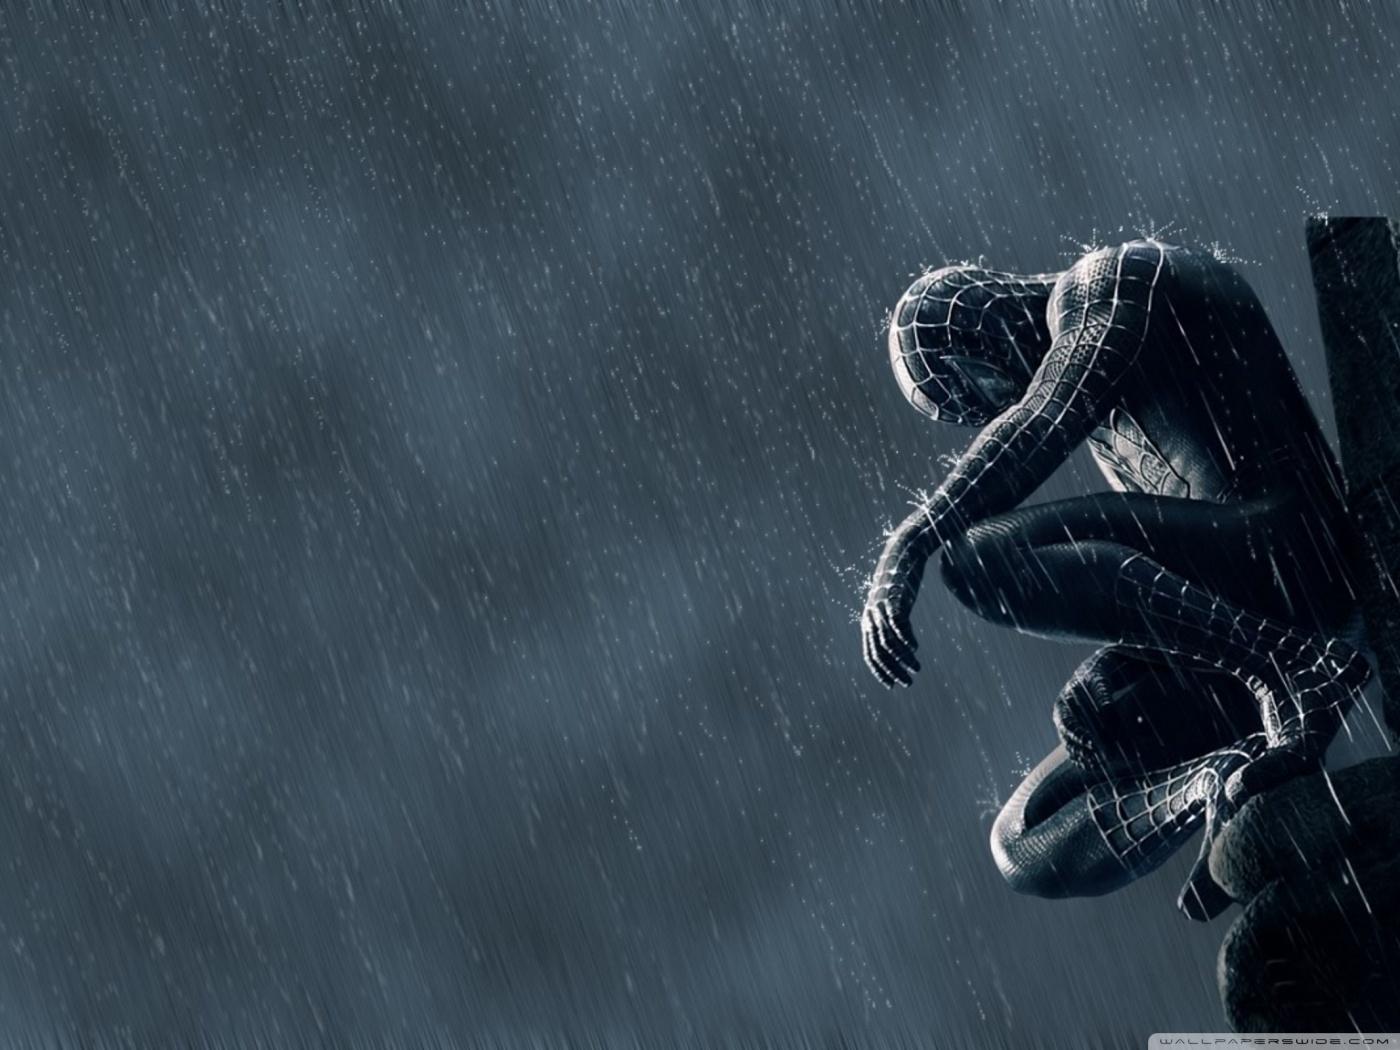 Hd Spiderman Black Suit - HD Wallpaper